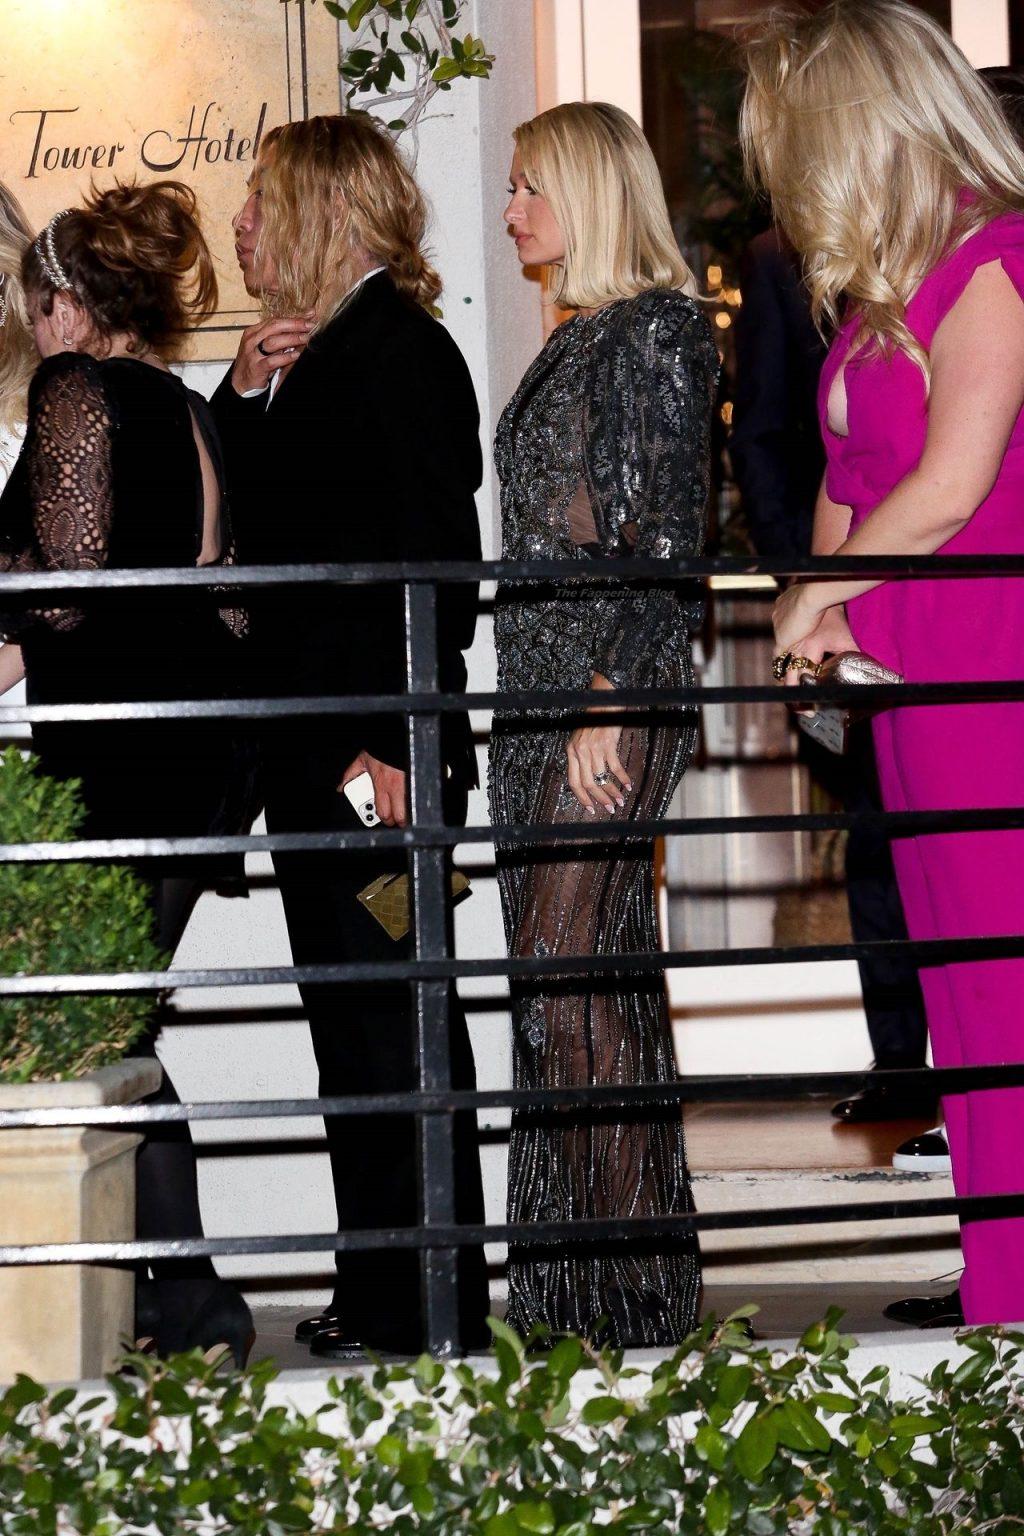 Paris Hilton & Oscar Nominee Maria Bakalova Head to Academy Awards After Party Together (61 Photos)